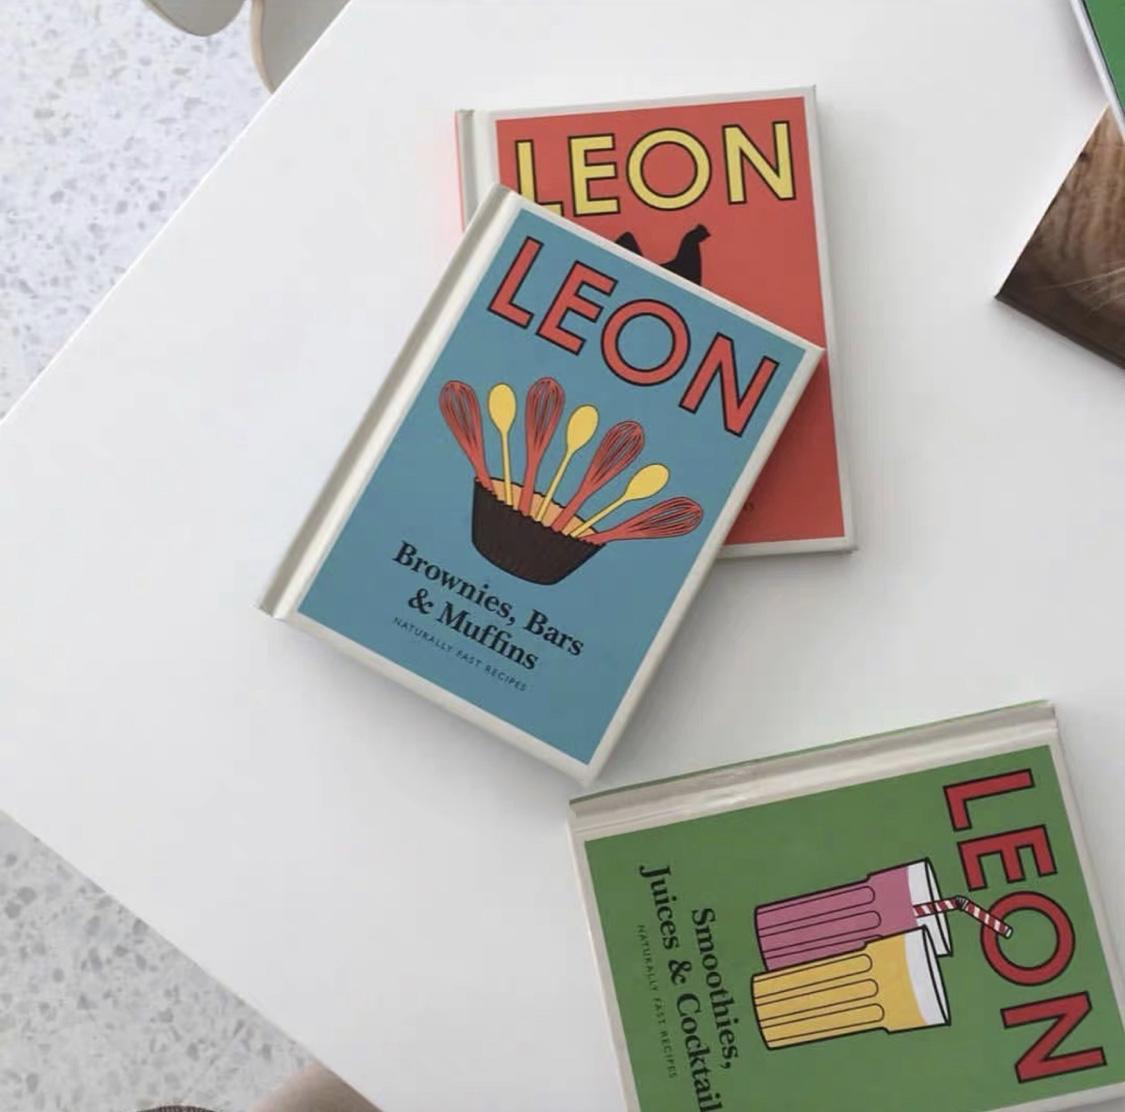 Leon ノート